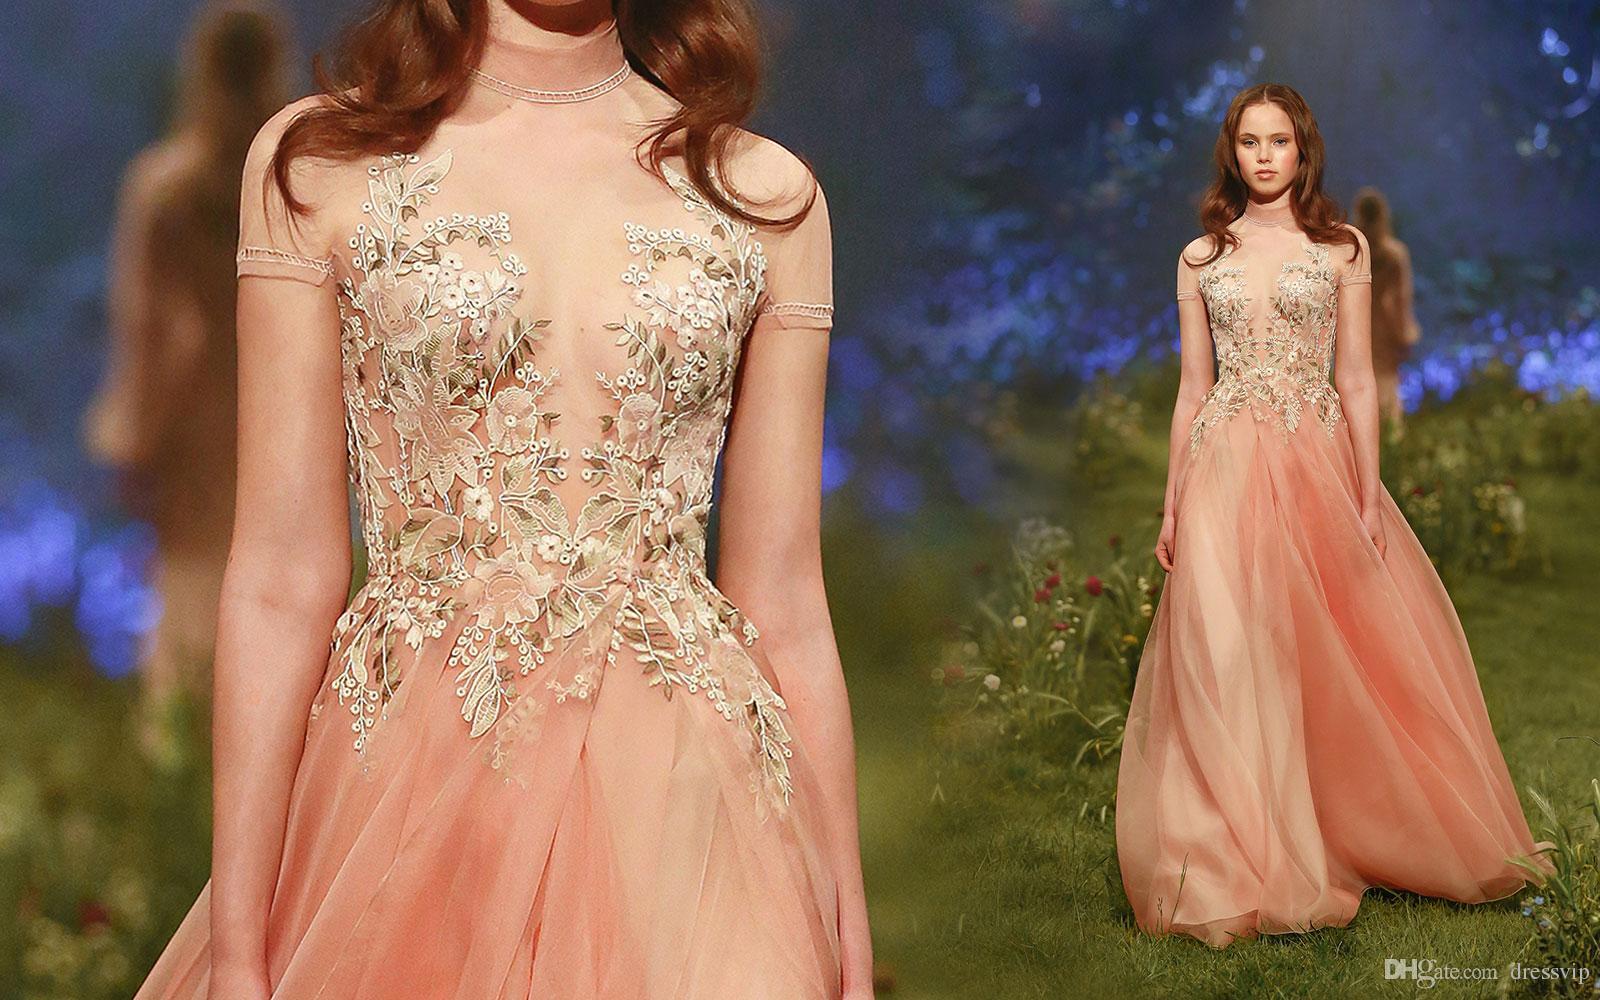 2018 Paolo Sebastian Prom Dress Long High Neck Tulle Applique Short Sleeve Formal Dress Party Wear Sexy Evening Gowns Vestidos De Quinceañer